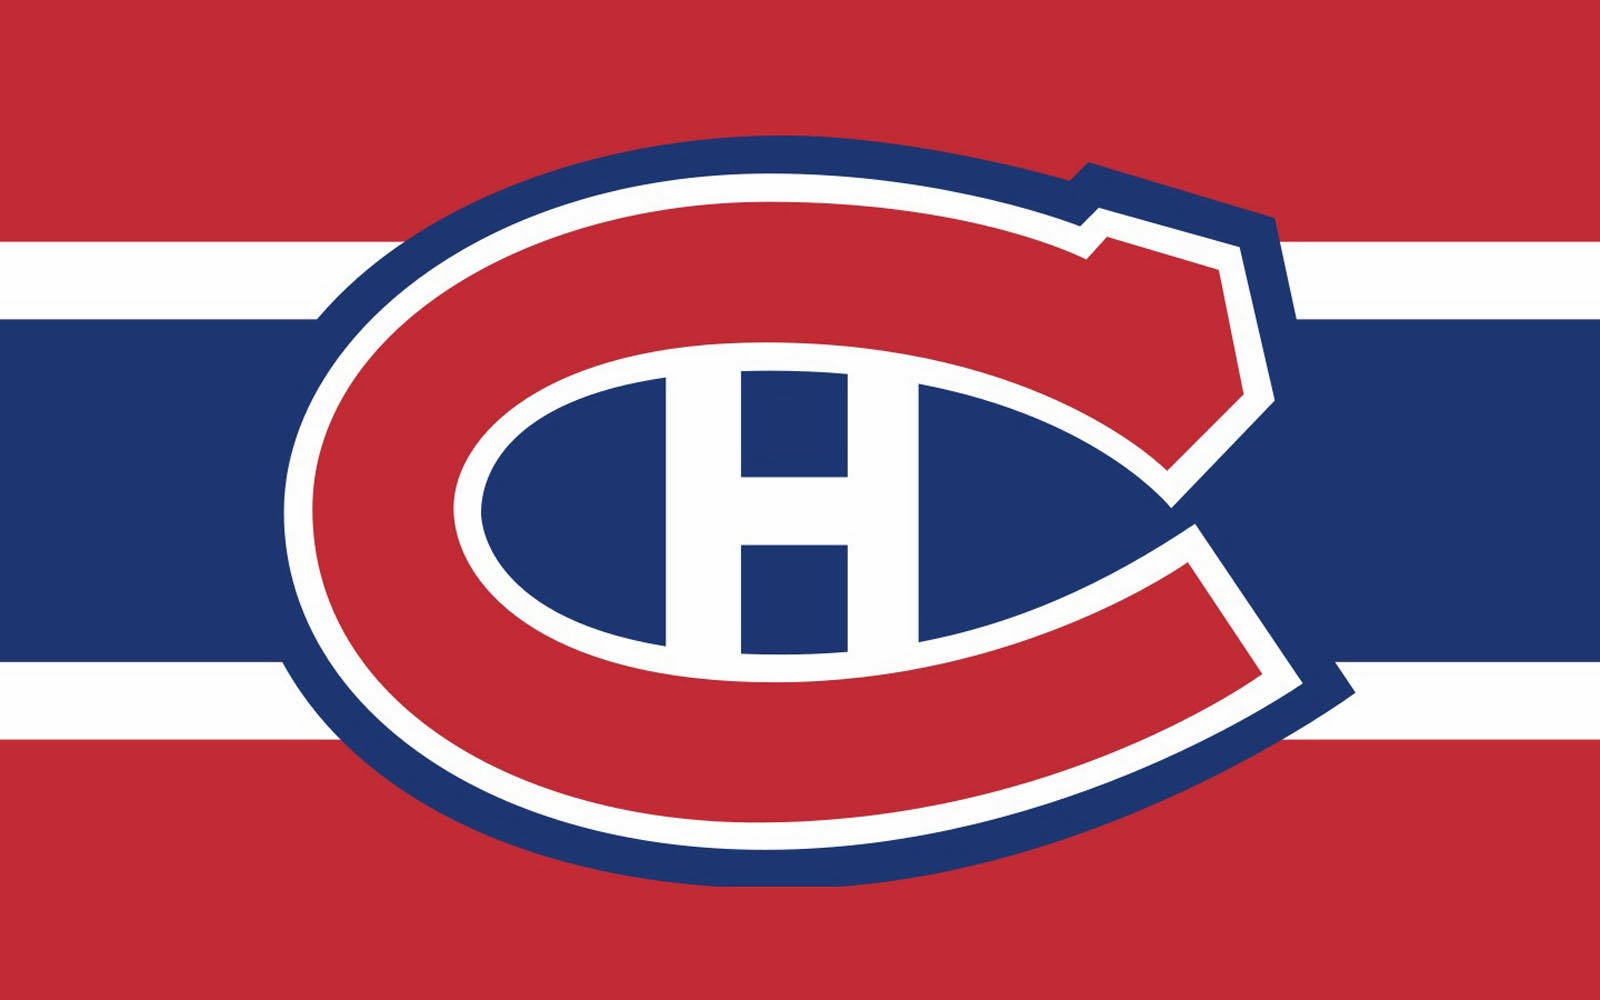 Montreal Canadiens Wallpapers Montreal Canadiens Desktop Wallpapers 1600x1000